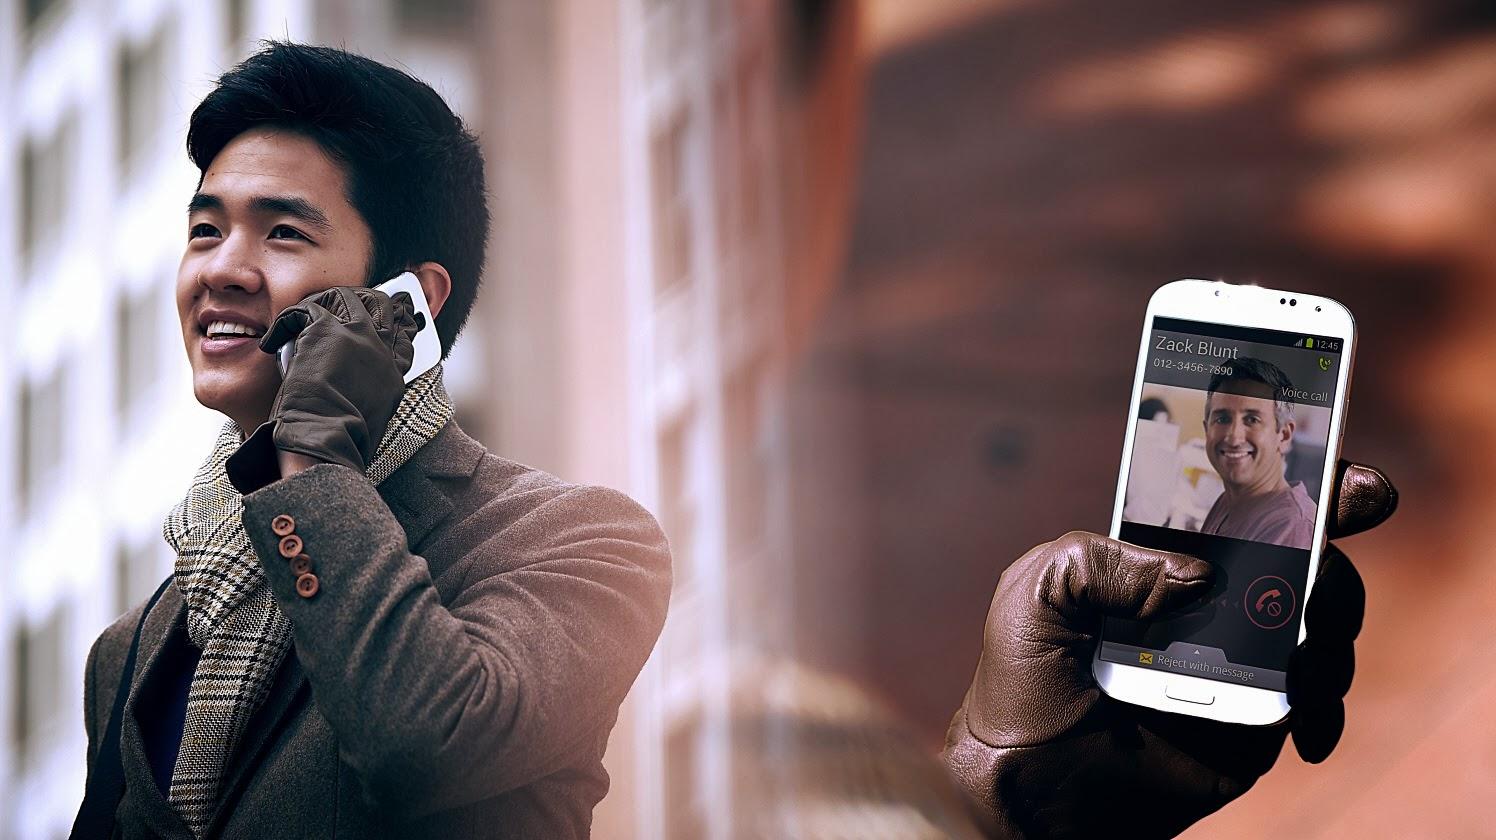 LifeStyle Samsung Galaxy S4